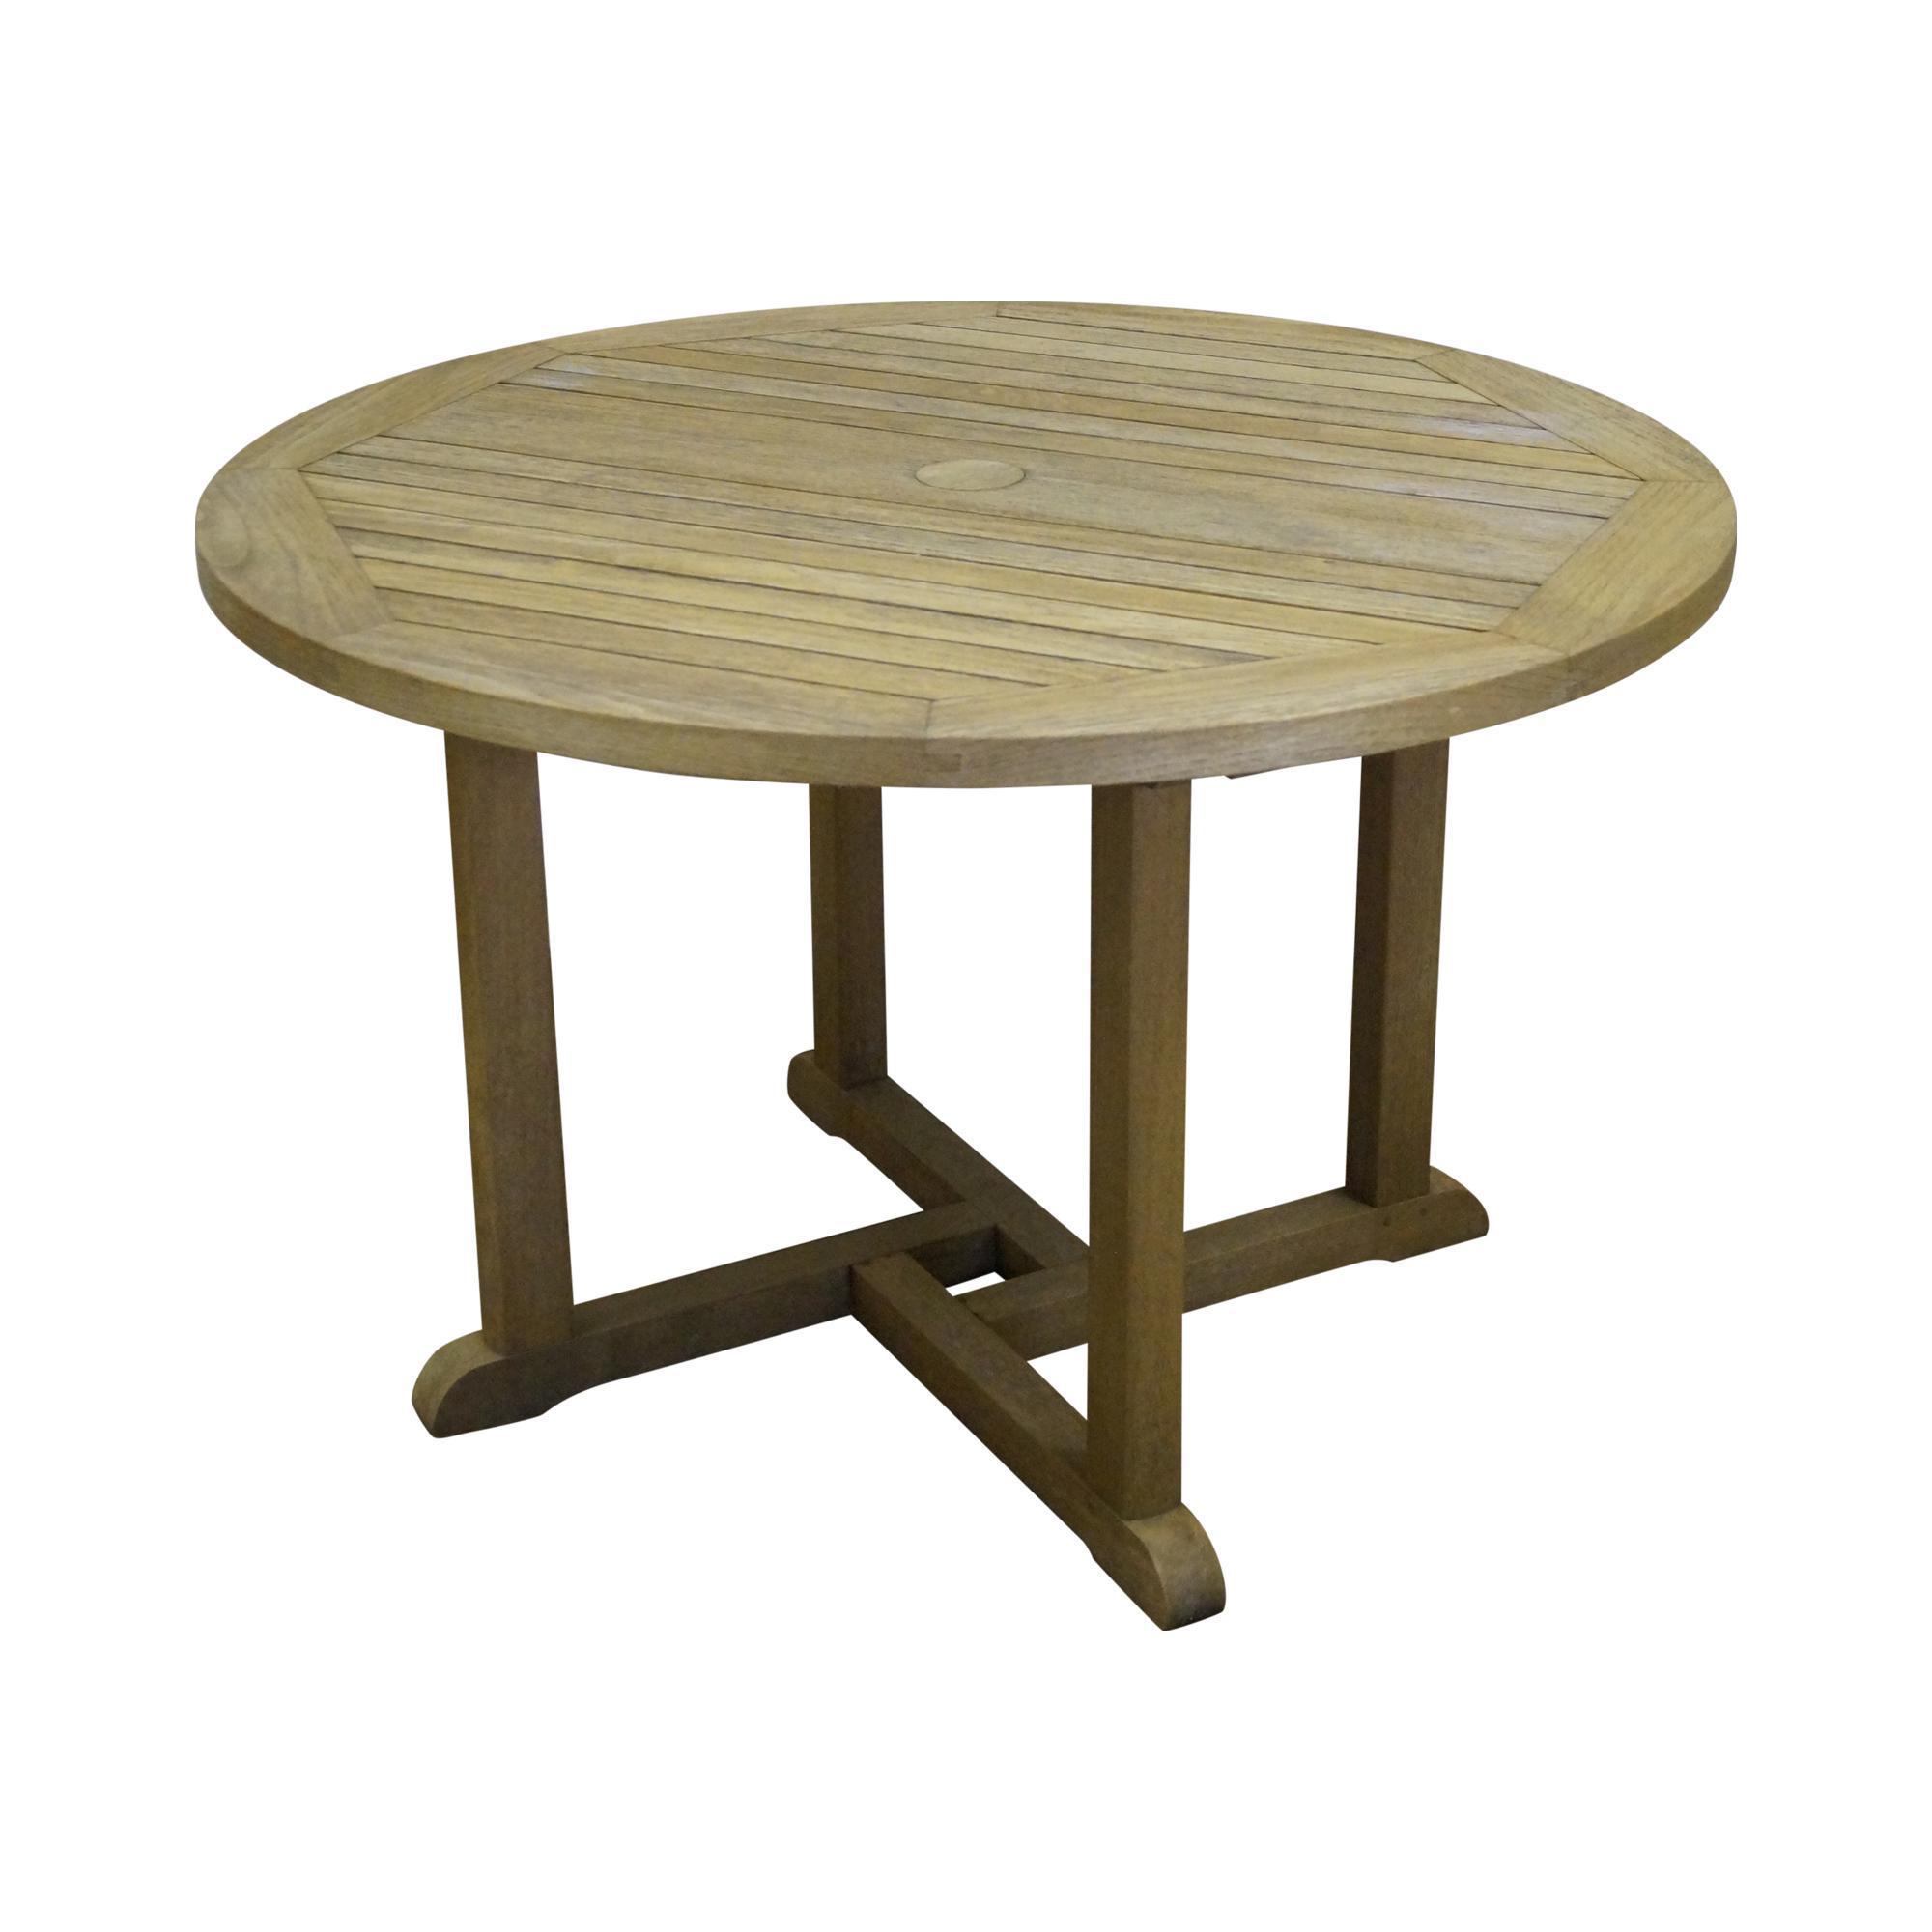 Barlow tyrie teak outdoor waveney round dining table for Round teak outdoor table